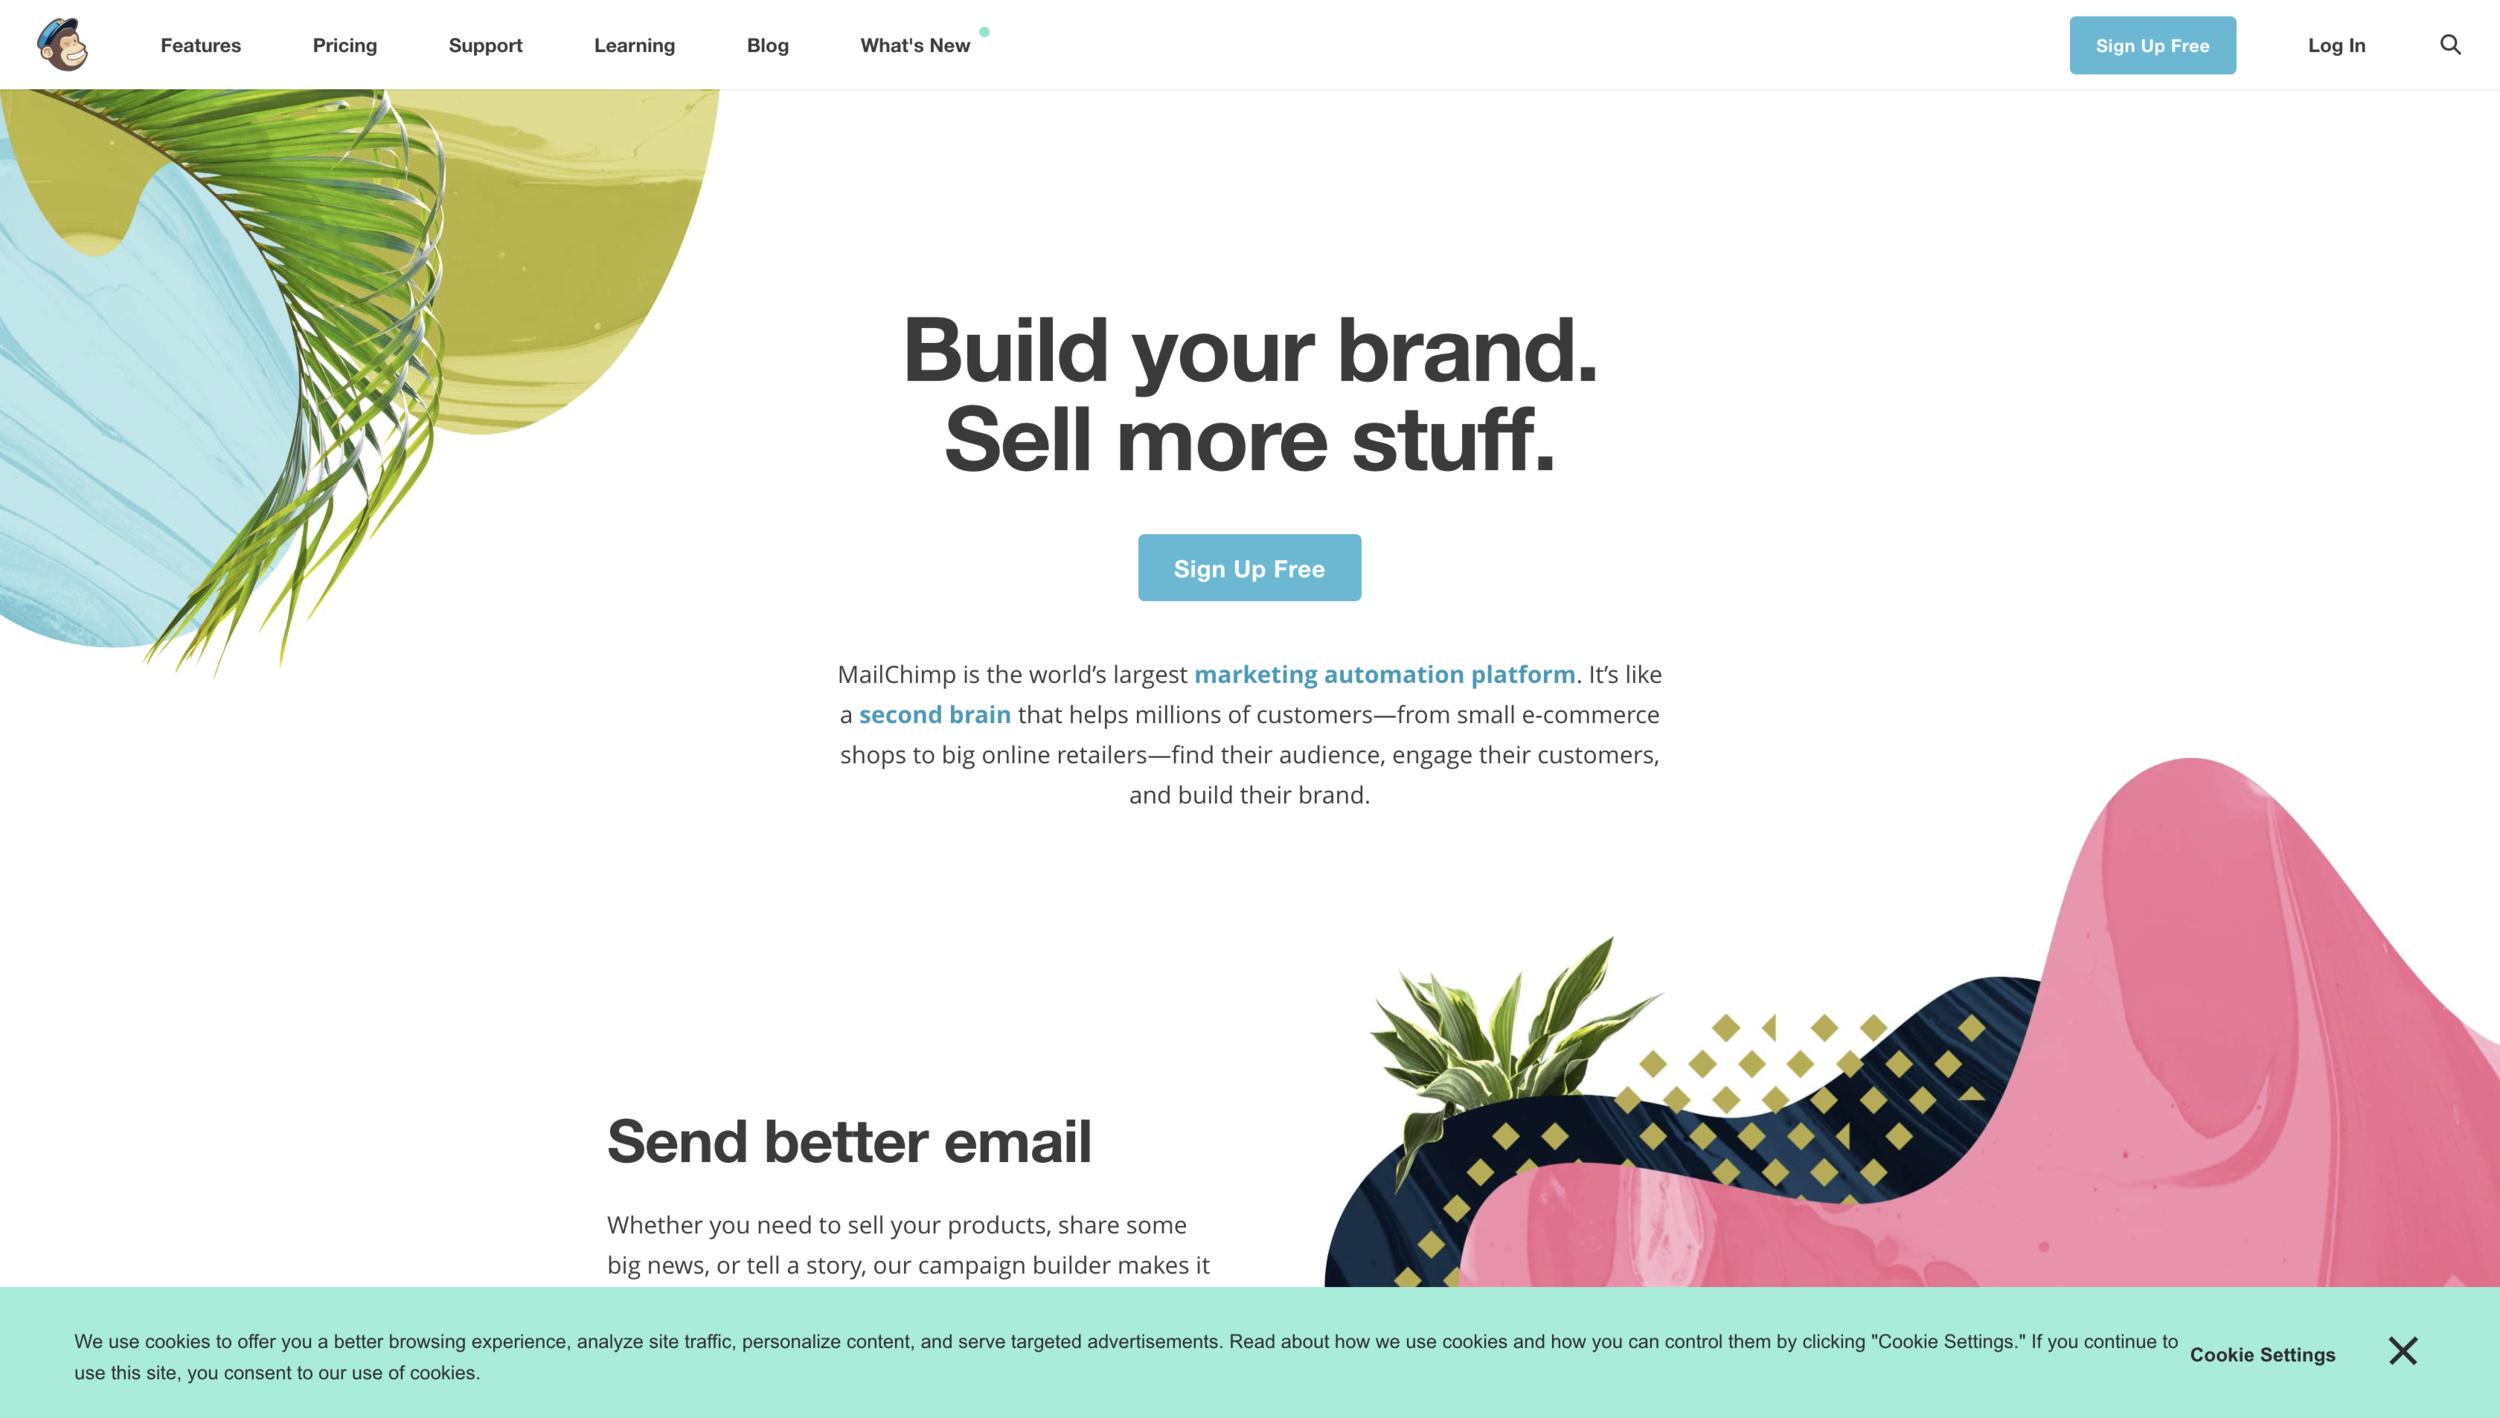 FireShot Capture 33 - Marketing Platform for Small Businesses - Sell More _ - https___mailchimp.com_.png